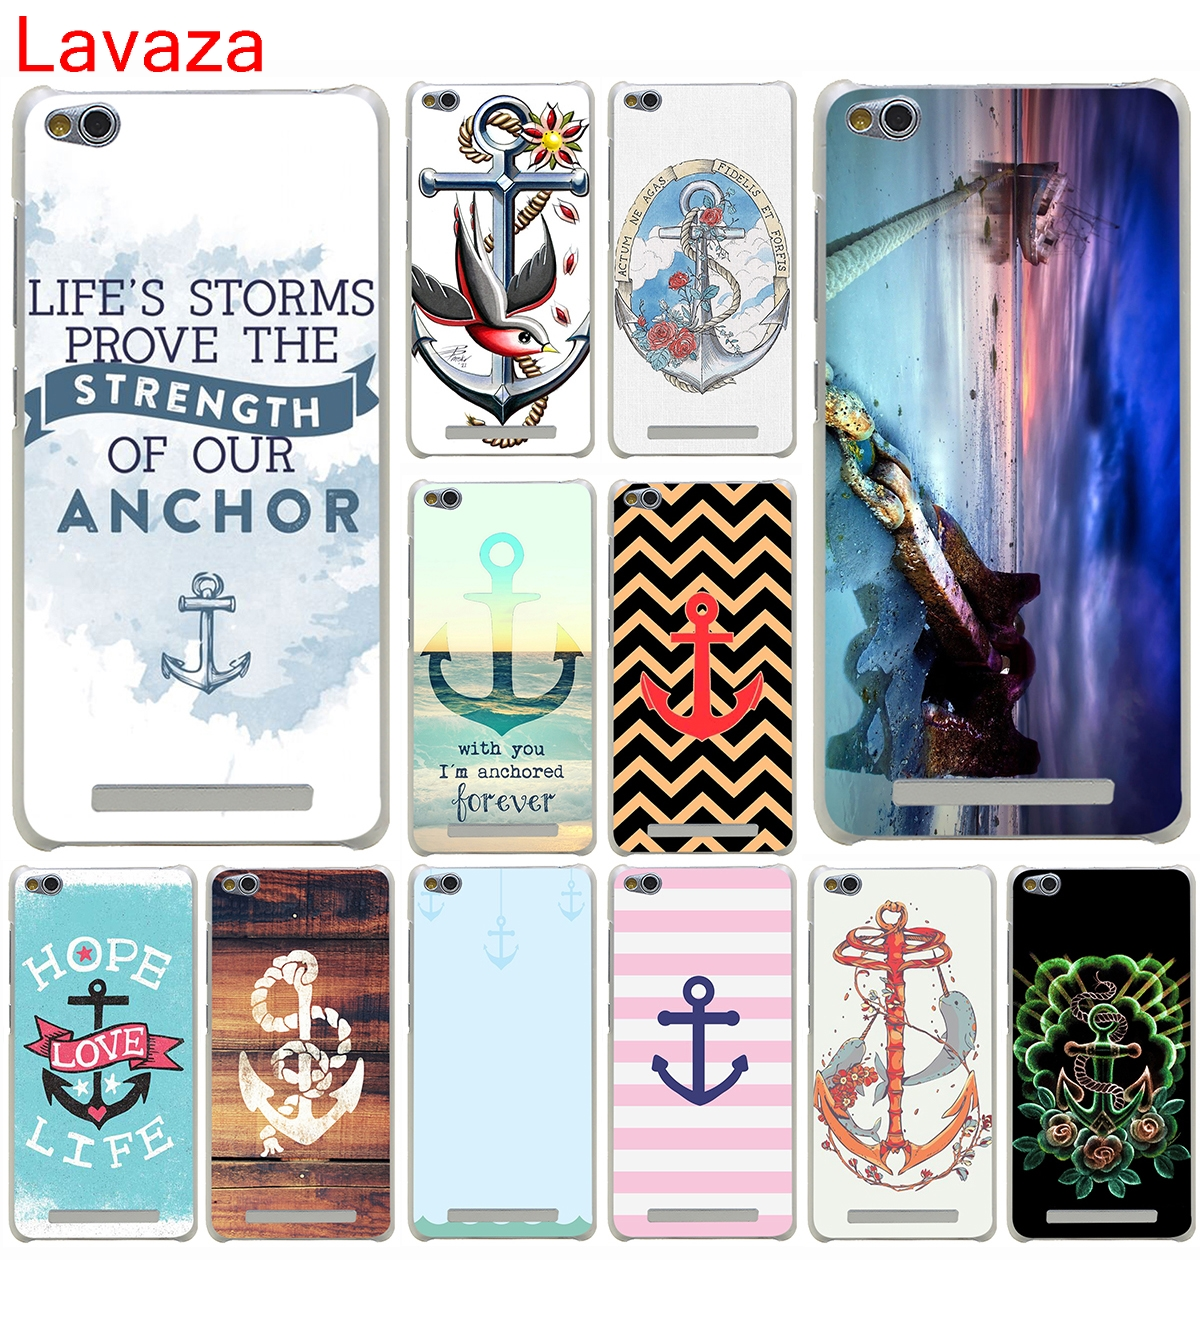 Lavaza Vintage Nautical Anchor White on Brown Wood Grain Hard Case for Xiaomi 6 5 5s Plus Redmi 3 4 Pro 4 Prime 4A Pro 4 4X